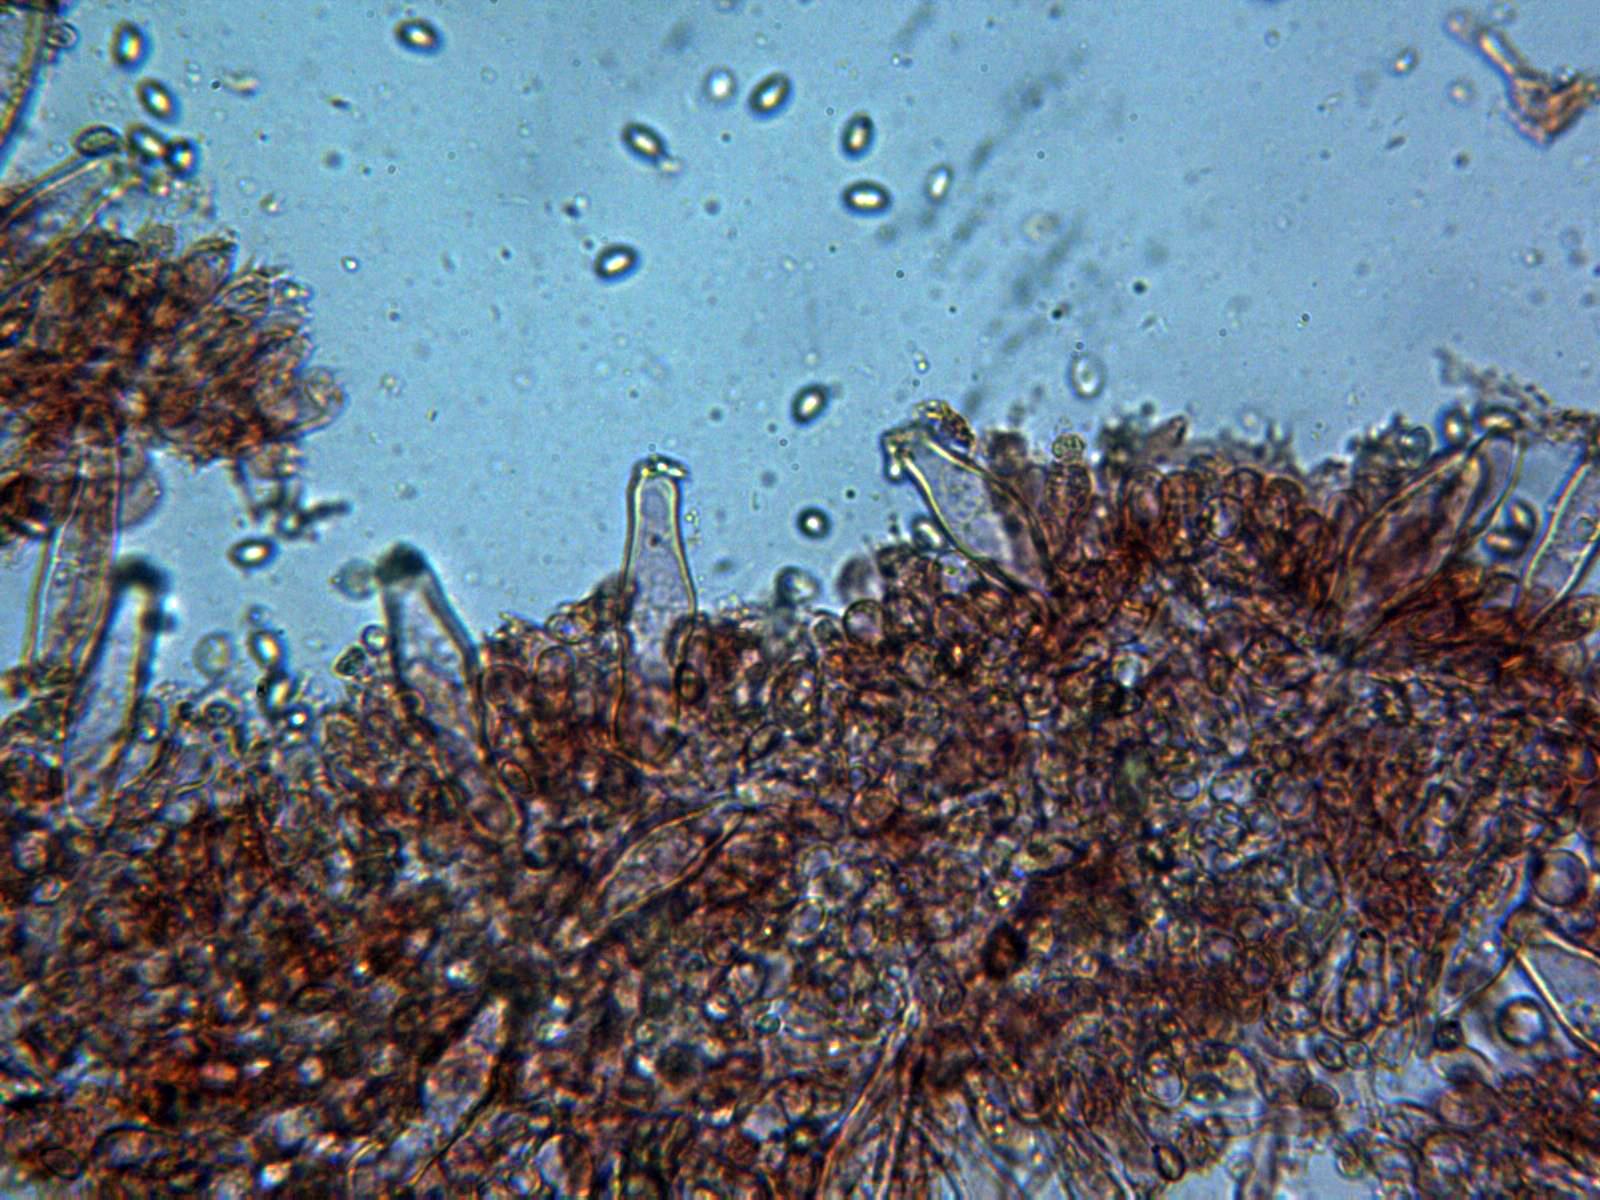 Queilocistidiosx400_2020-09-24-2.jpg